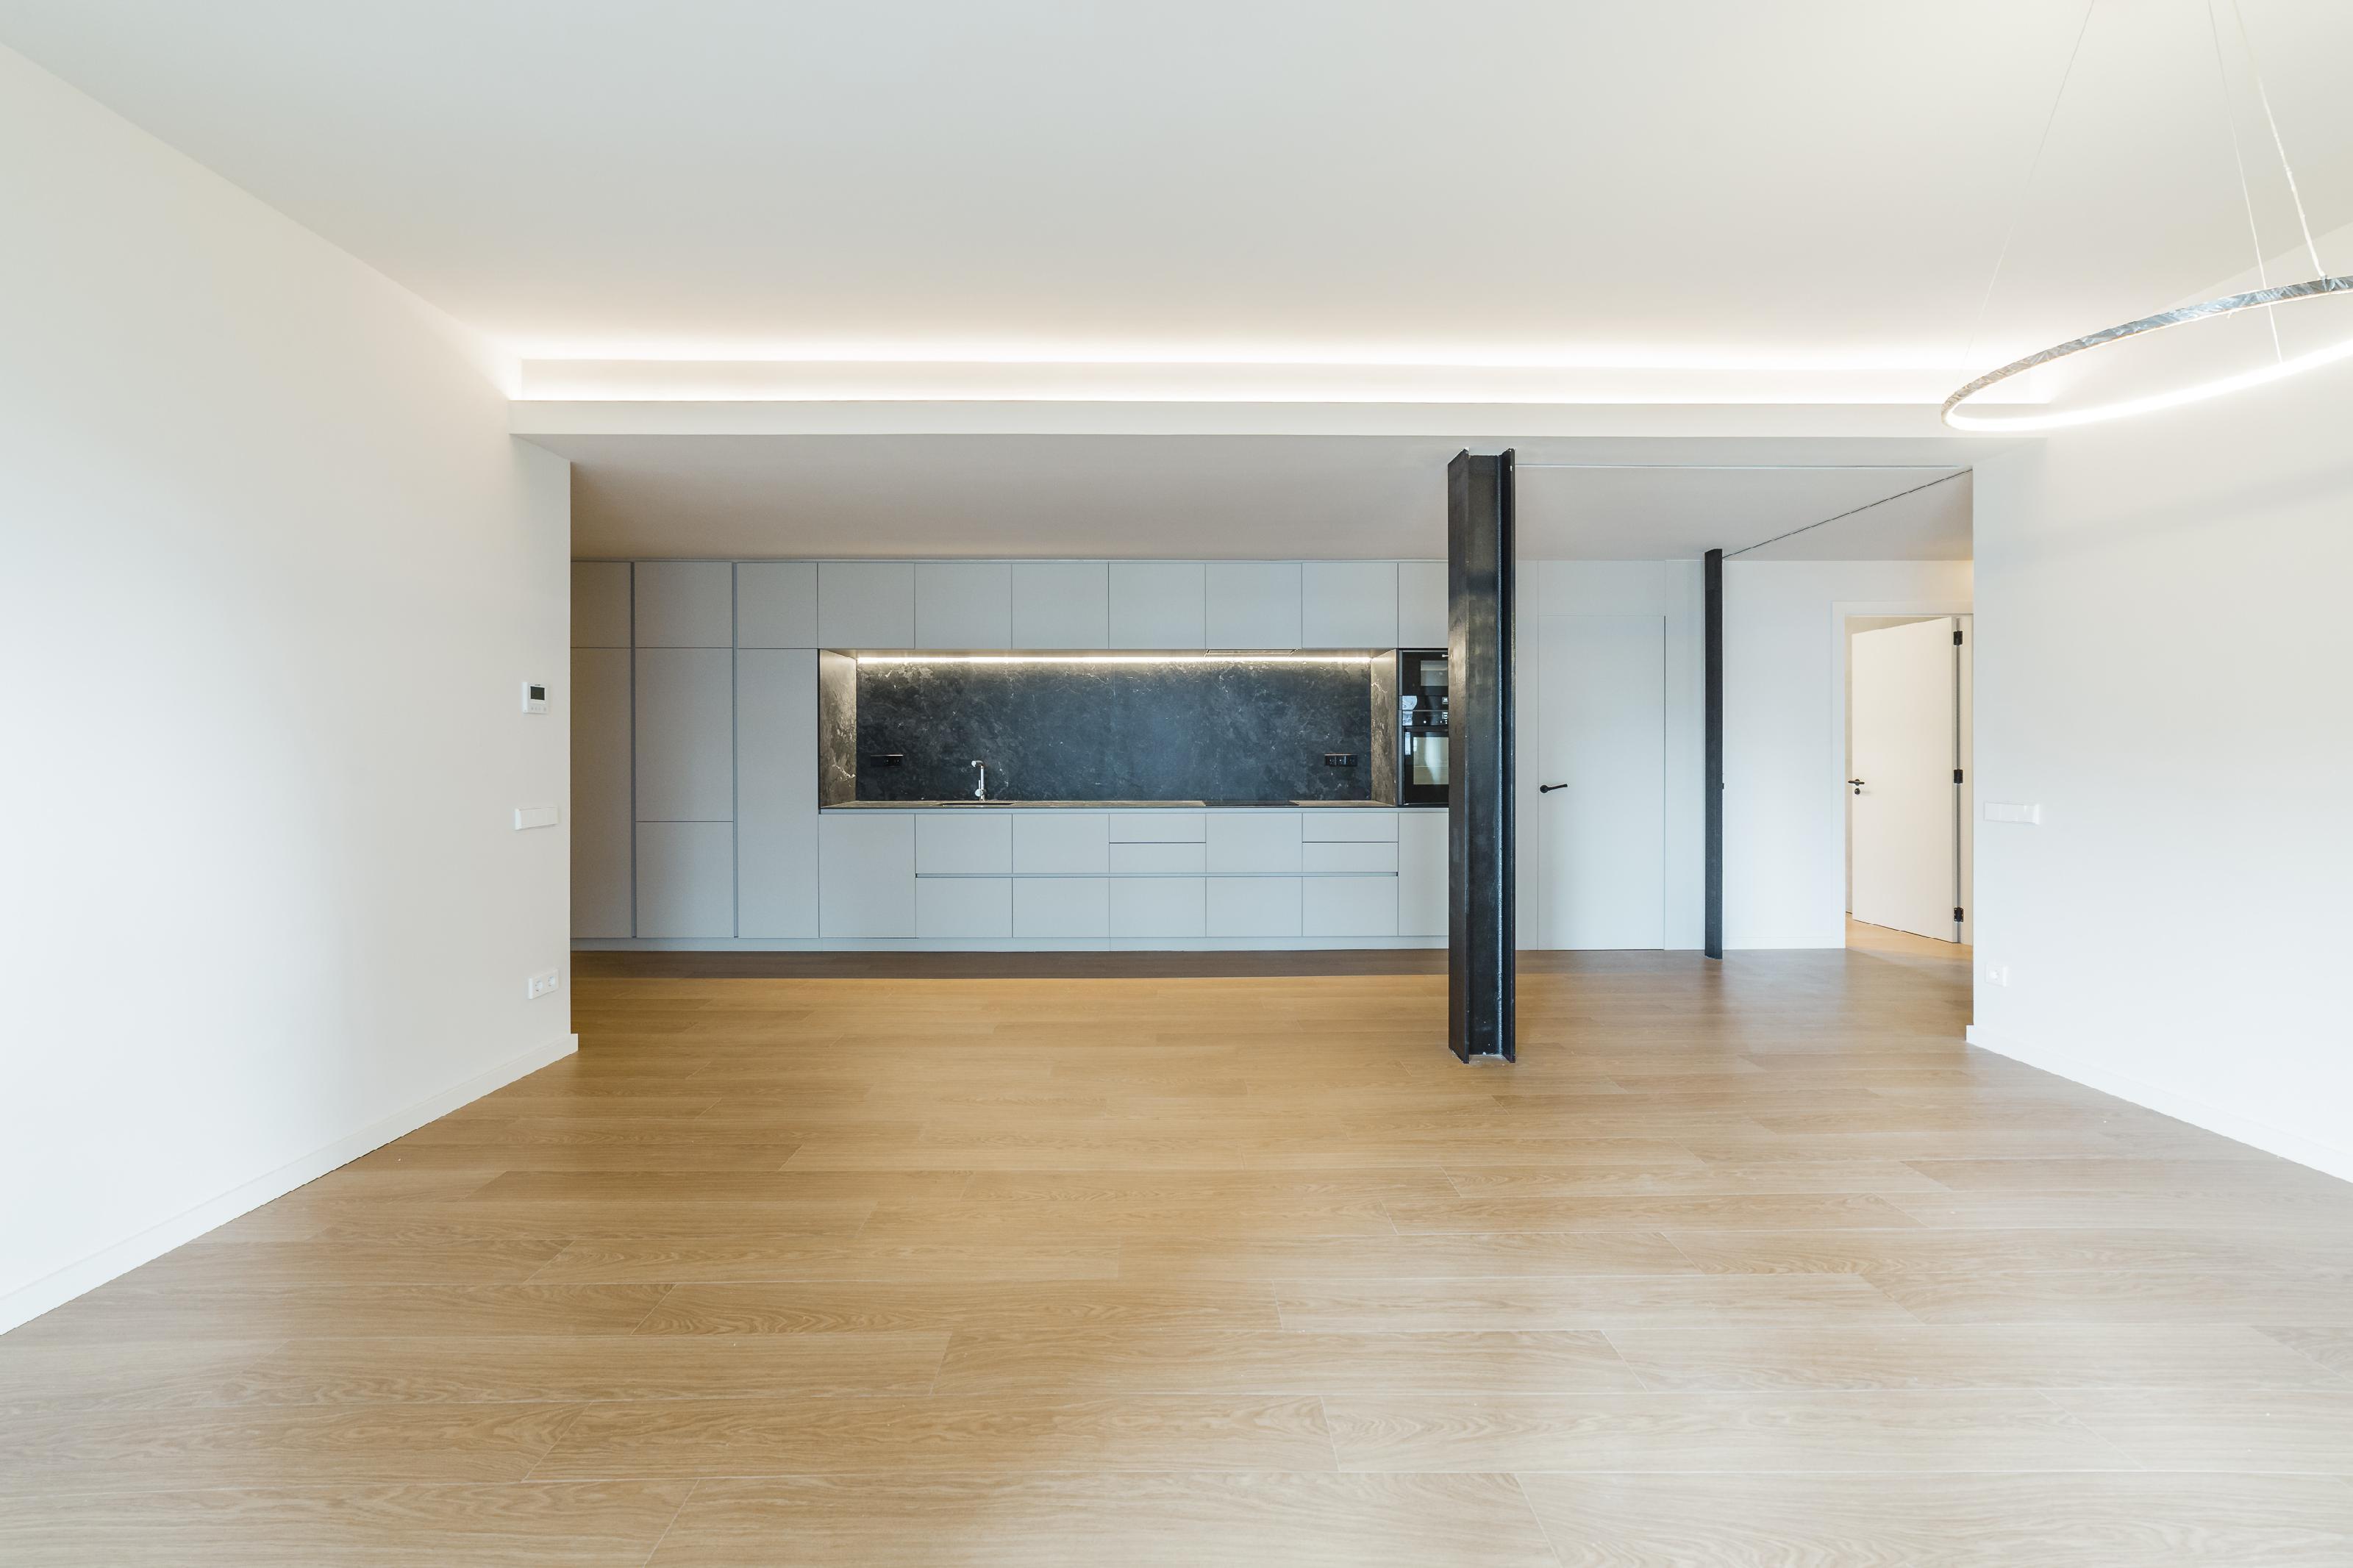 253492 Flat for sale in Sarrià-Sant Gervasi, Sant Gervasi-Galvany 15